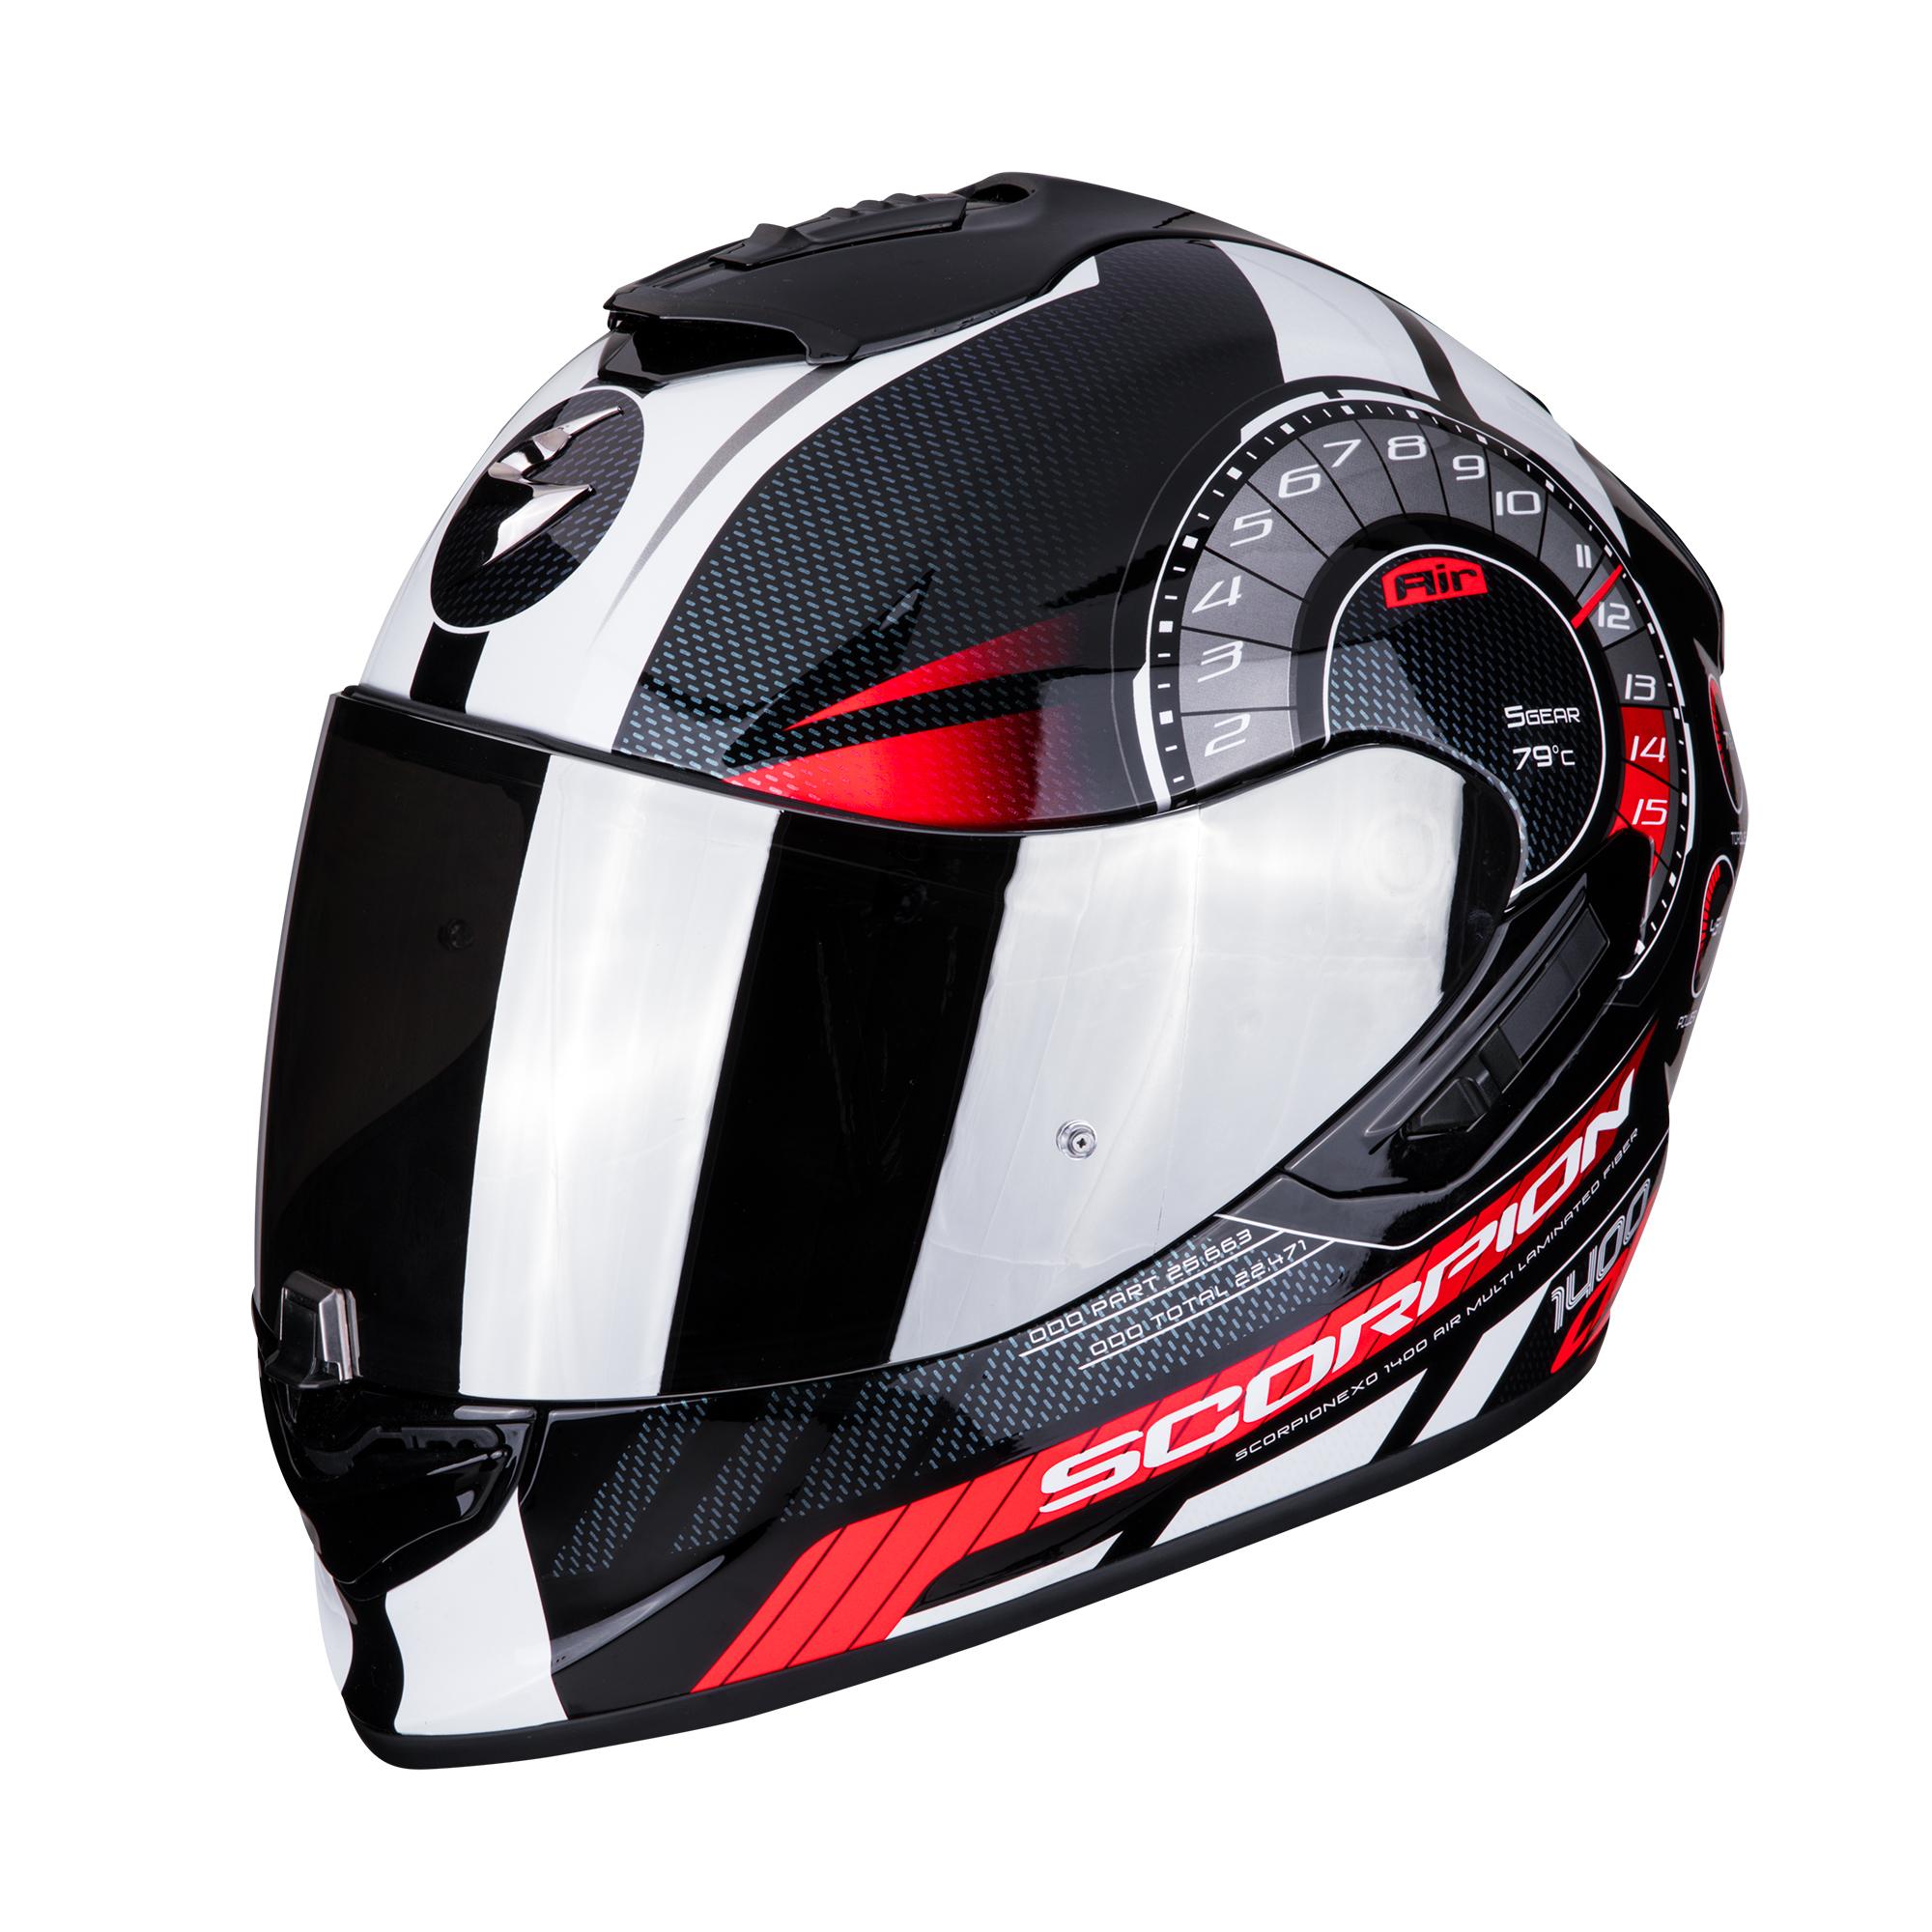 scorpion exo 1400 air torque black red scorpion helme. Black Bedroom Furniture Sets. Home Design Ideas